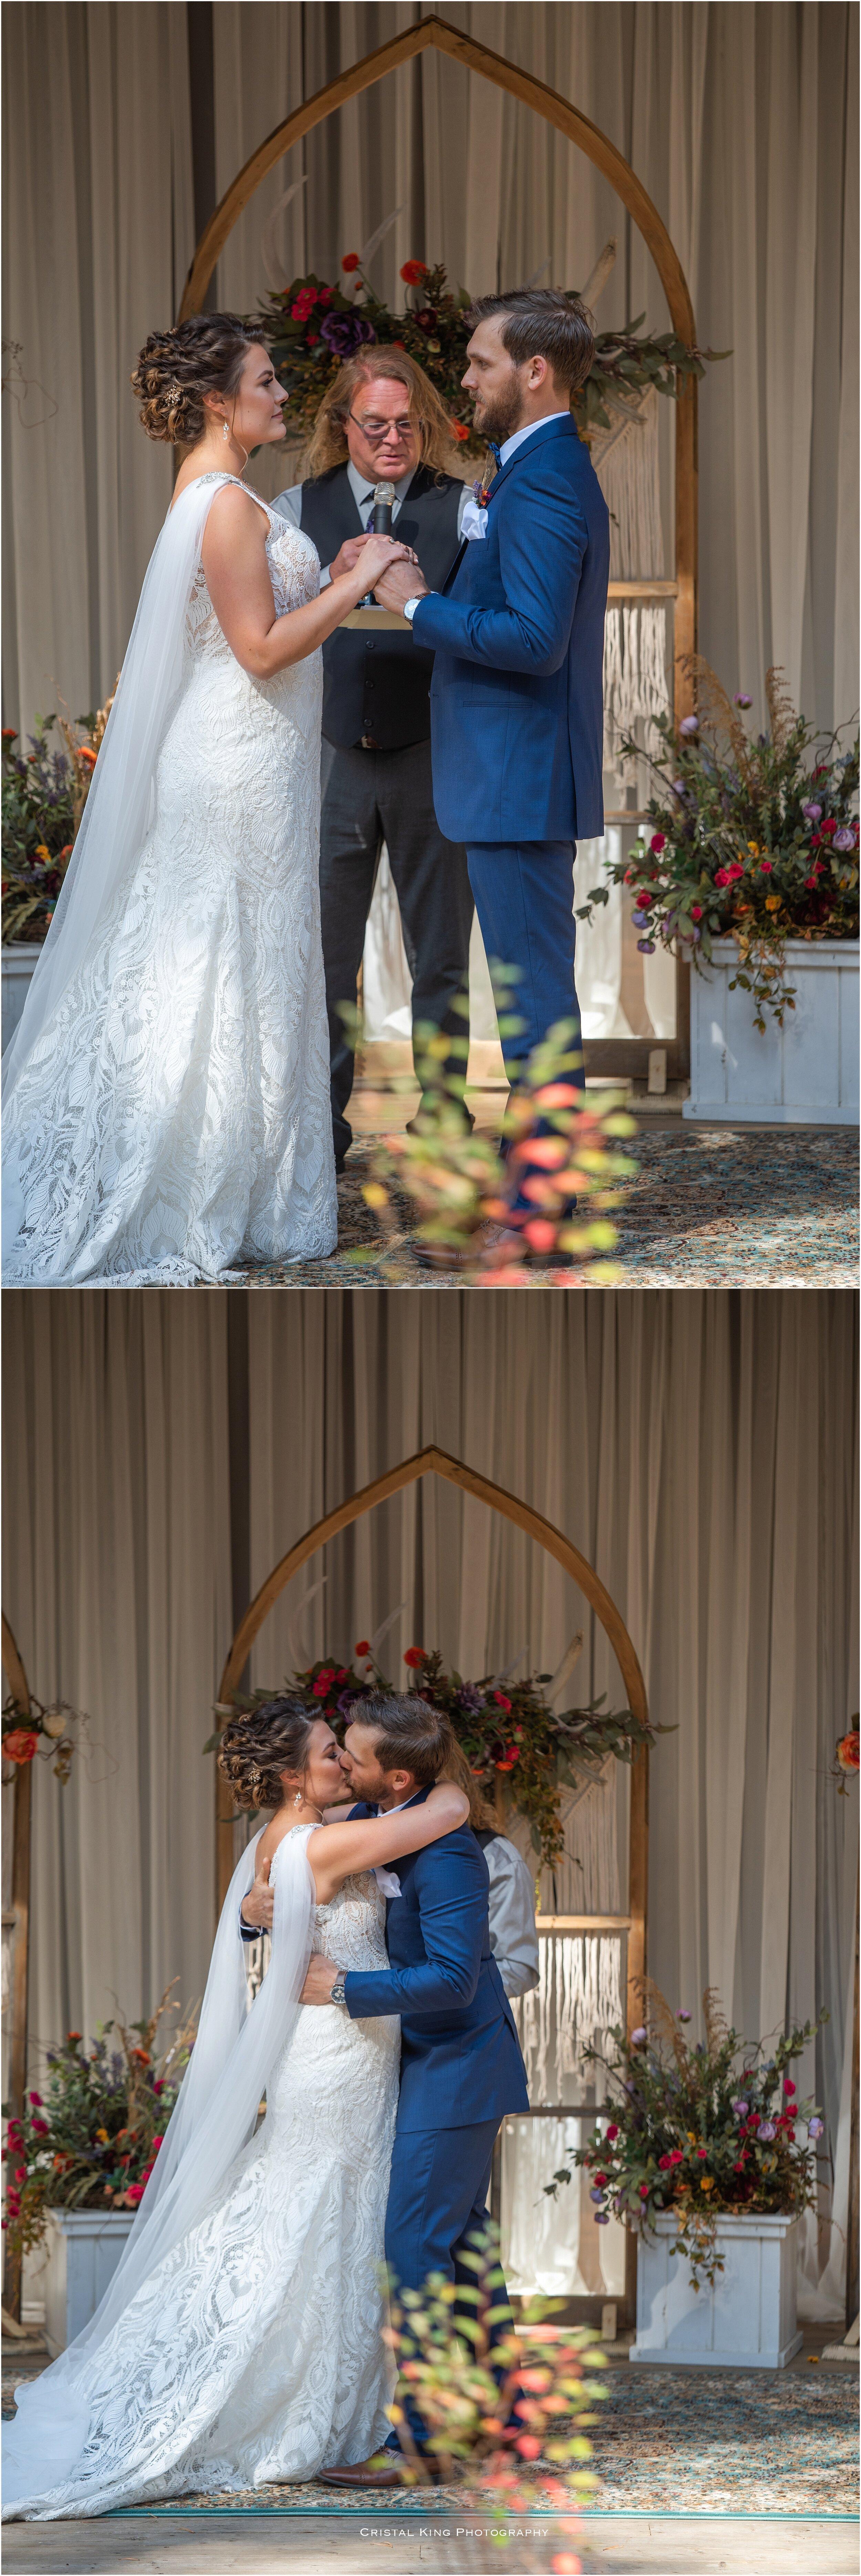 Sarah & Shaun's Wedding-66.jpg